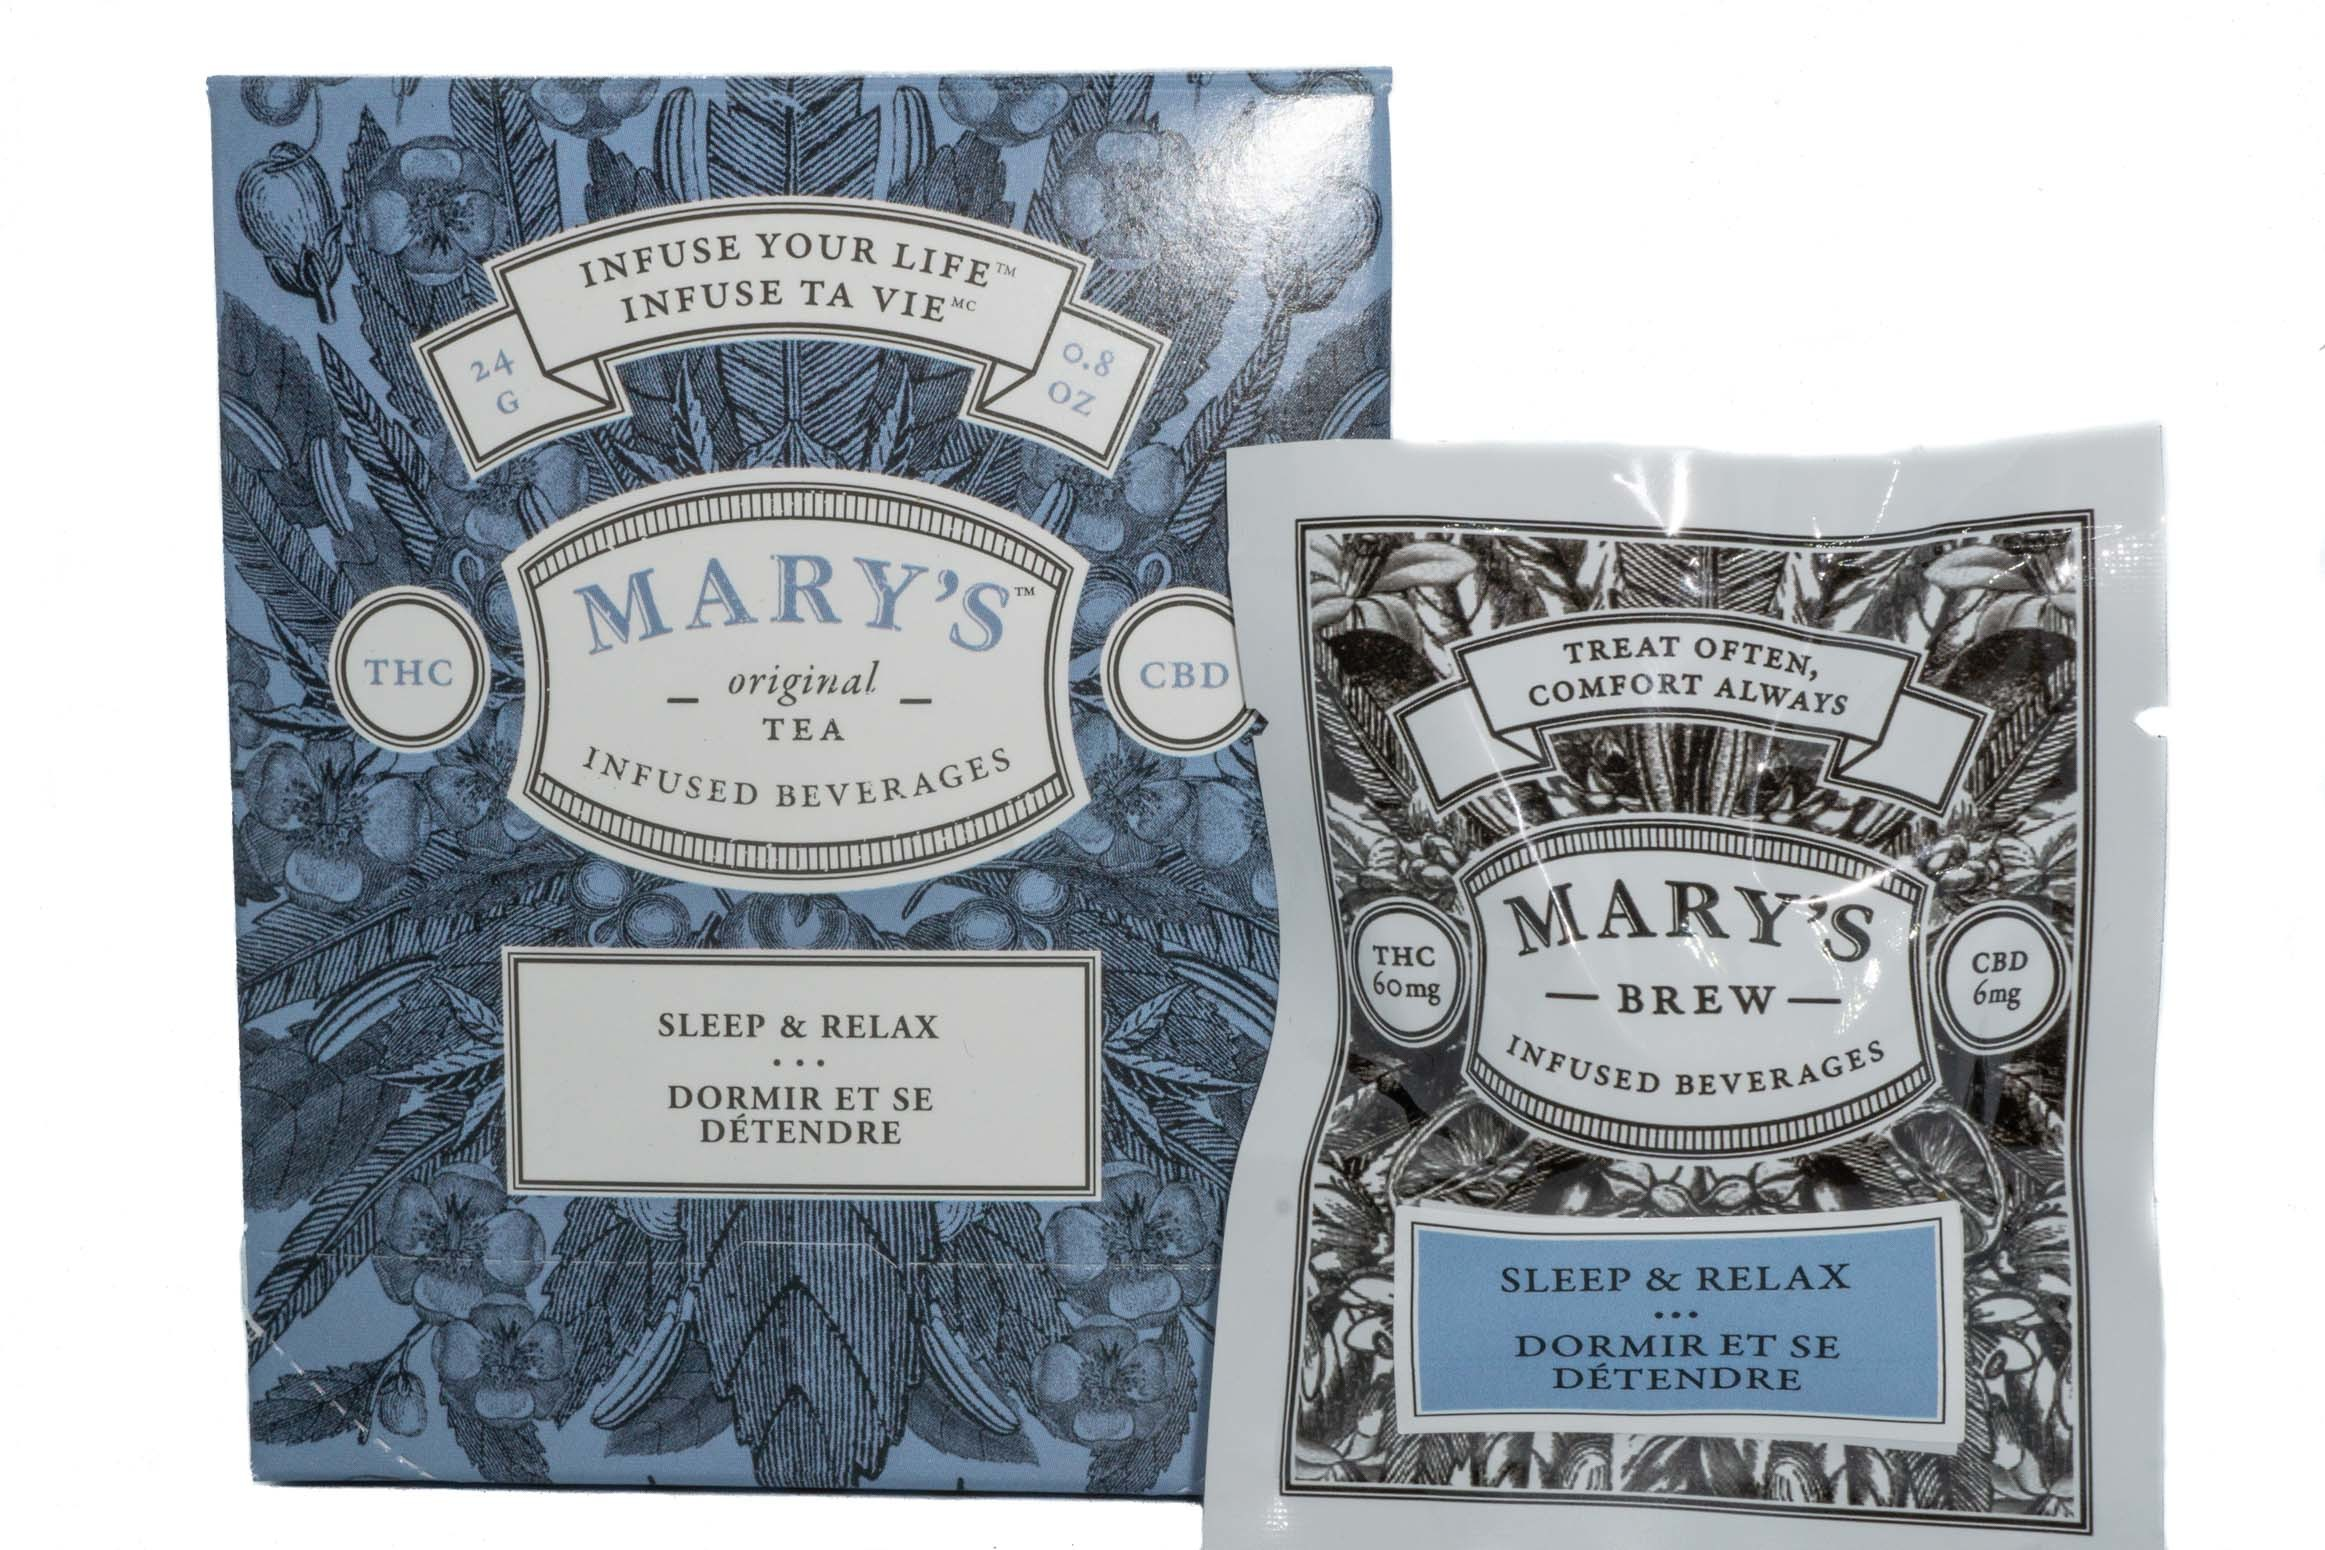 Mary's Wellness Sleep & Relax Tea (Single Sachet) (60mg THC/6mg CBD) 01234